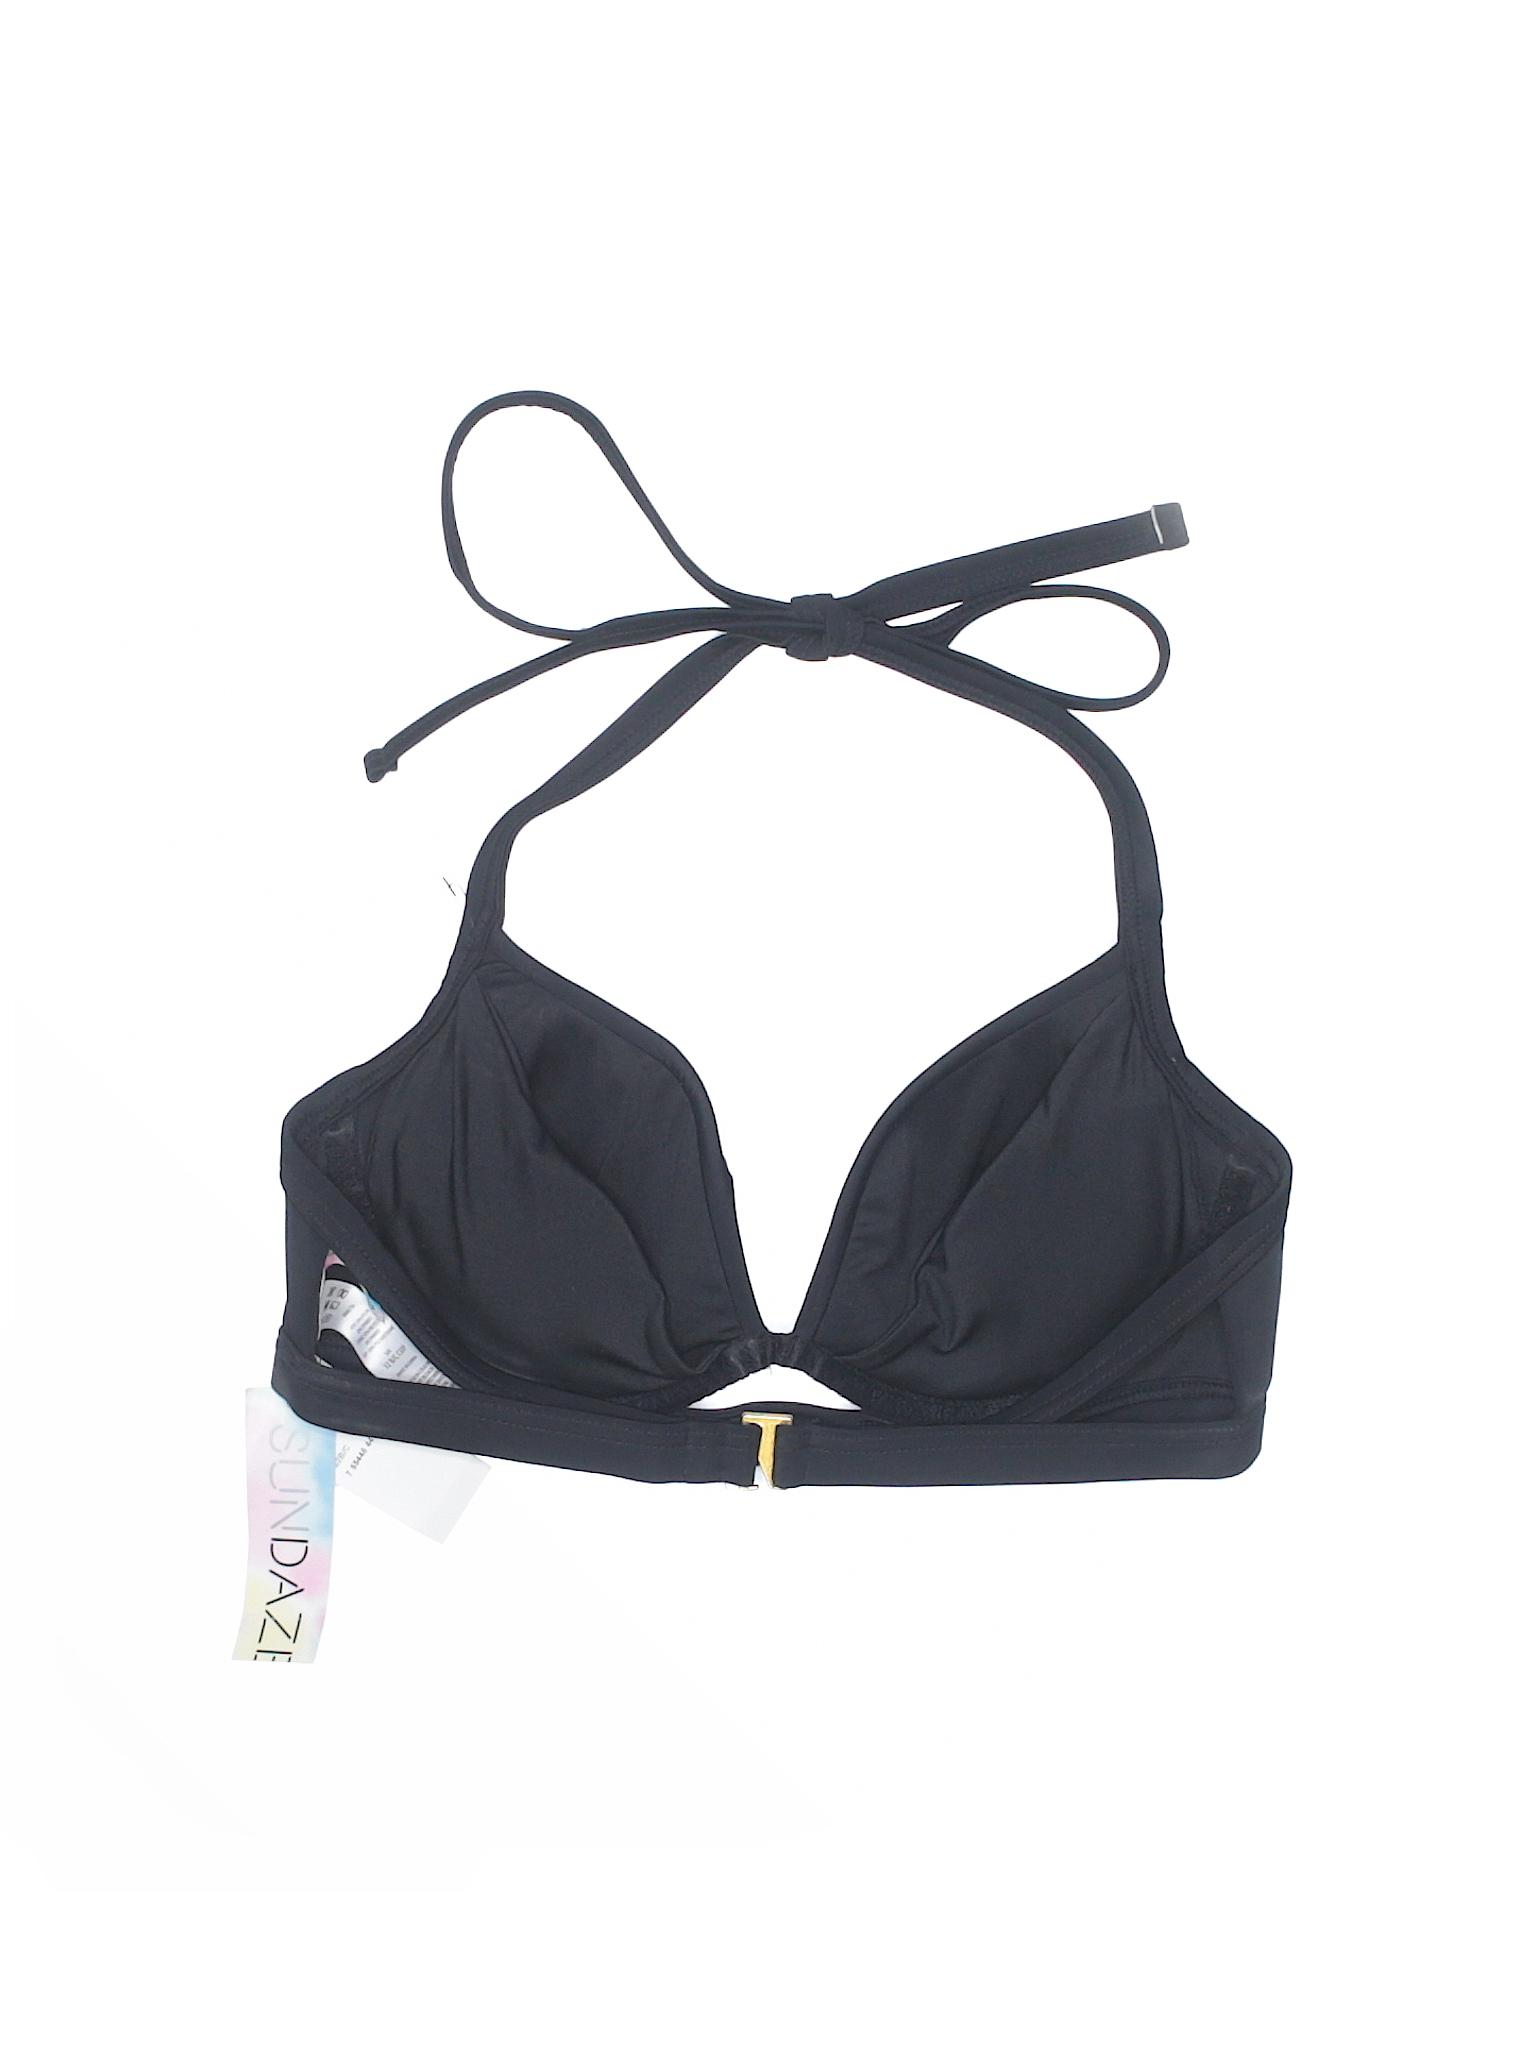 Swimsuit Sundazed Swimsuit Boutique Top Boutique Top Boutique Sundazed OZwaZq